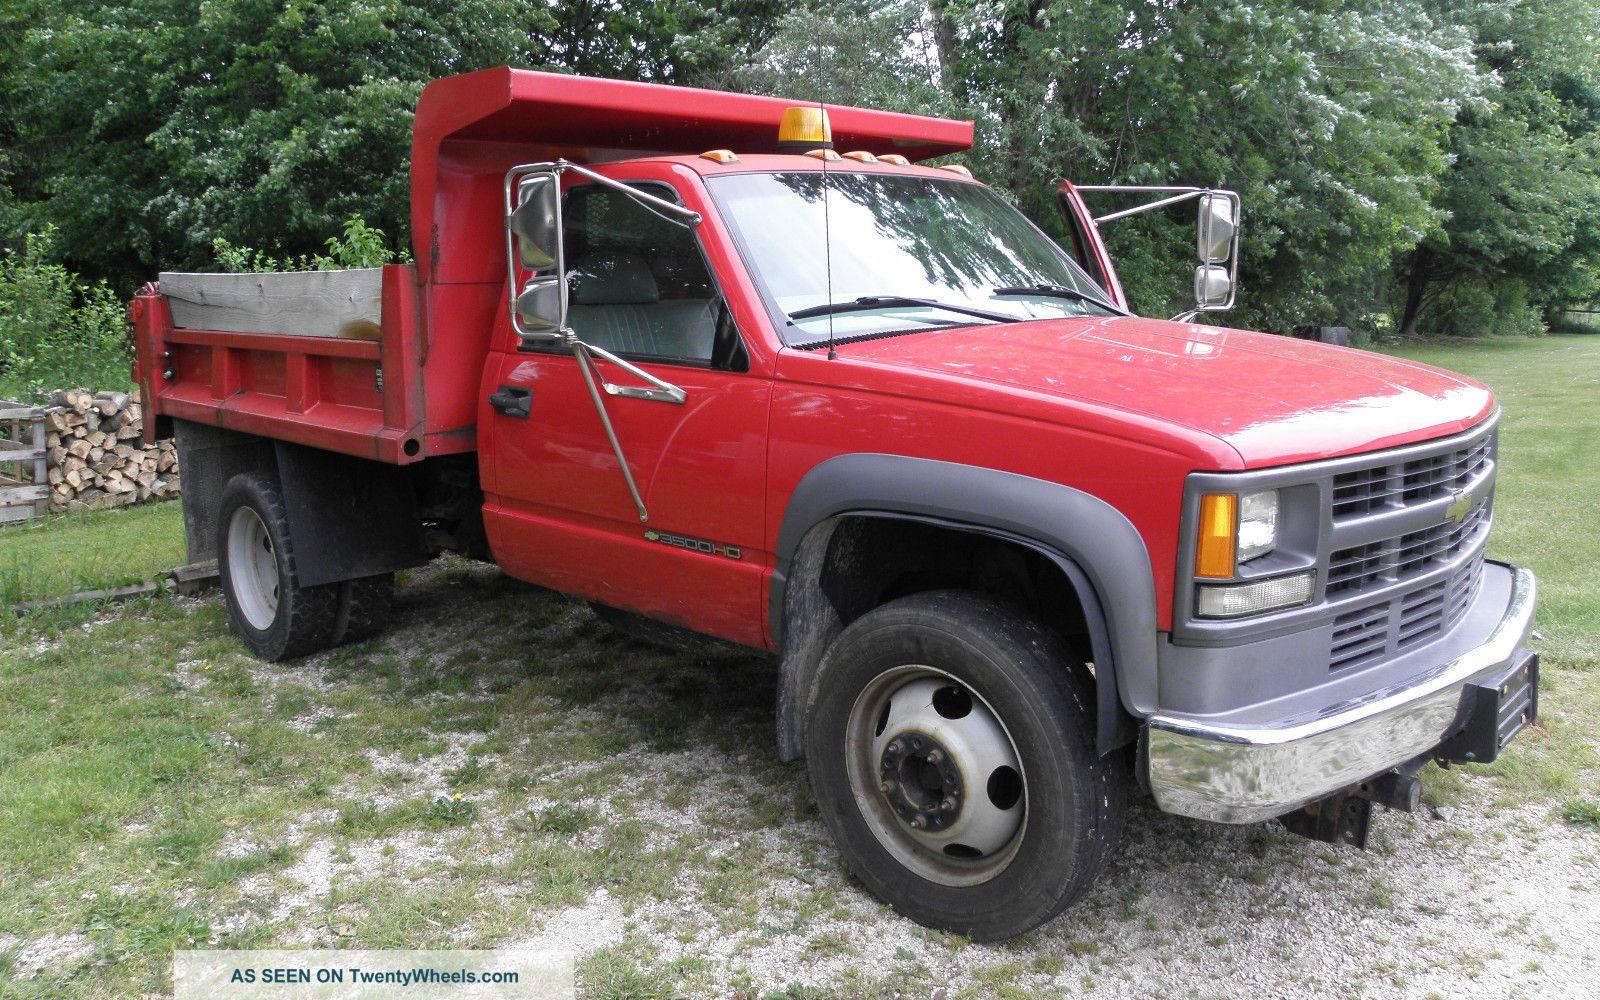 Craigslist Philadelphia Cars And Trucks >> 2000 Chevy 3500 Hd Dump Truck Parts | Autos Post